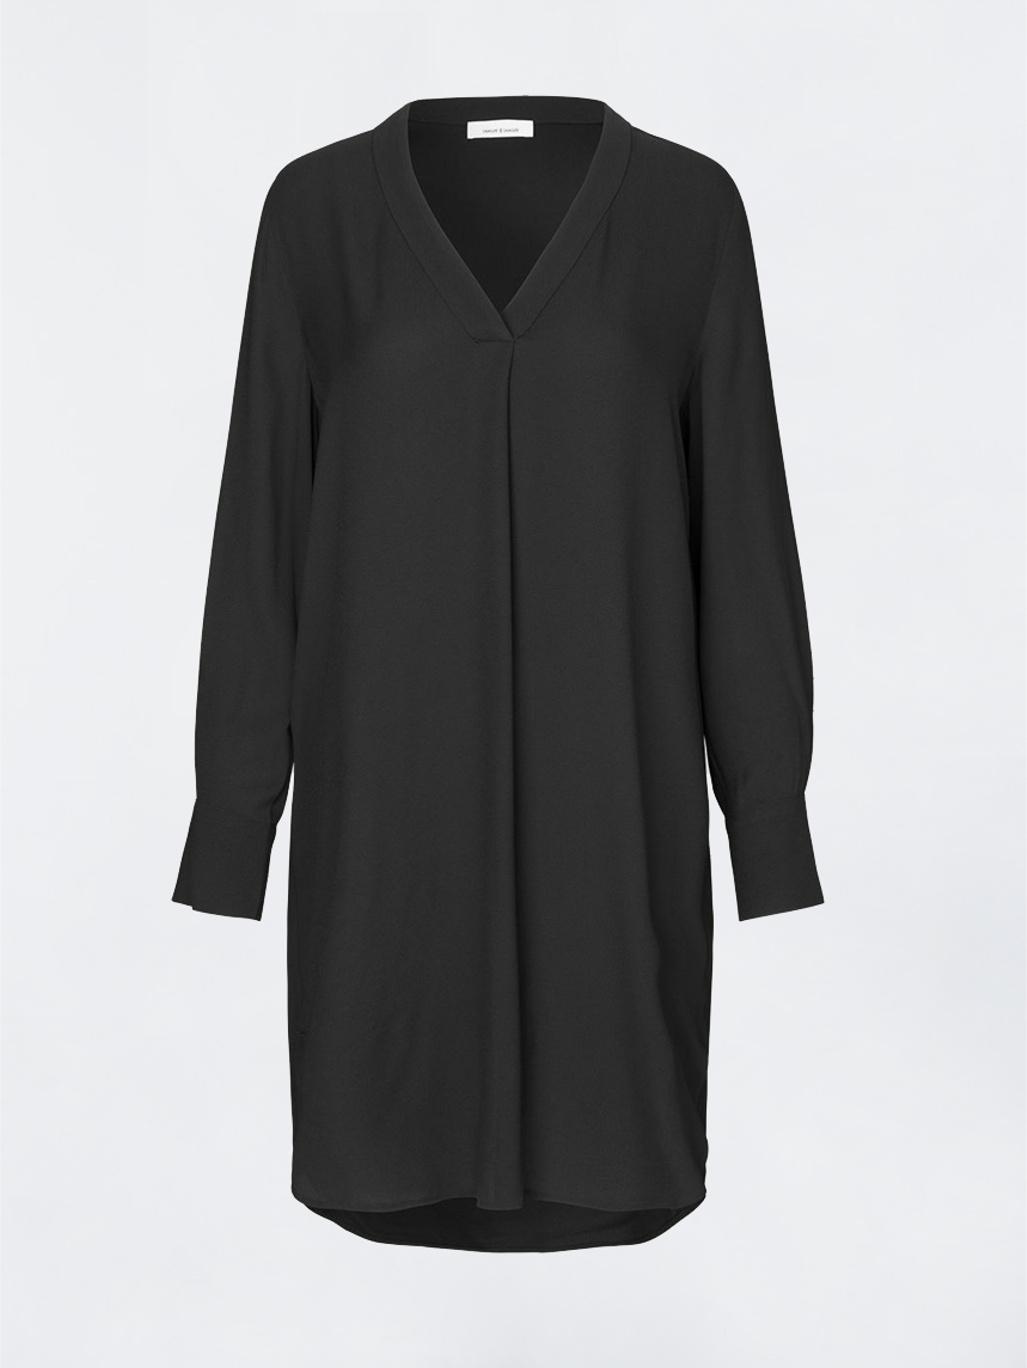 bd17d3bc7592 Hamill vn dress 8325 Black - Samsøe & Samsøe